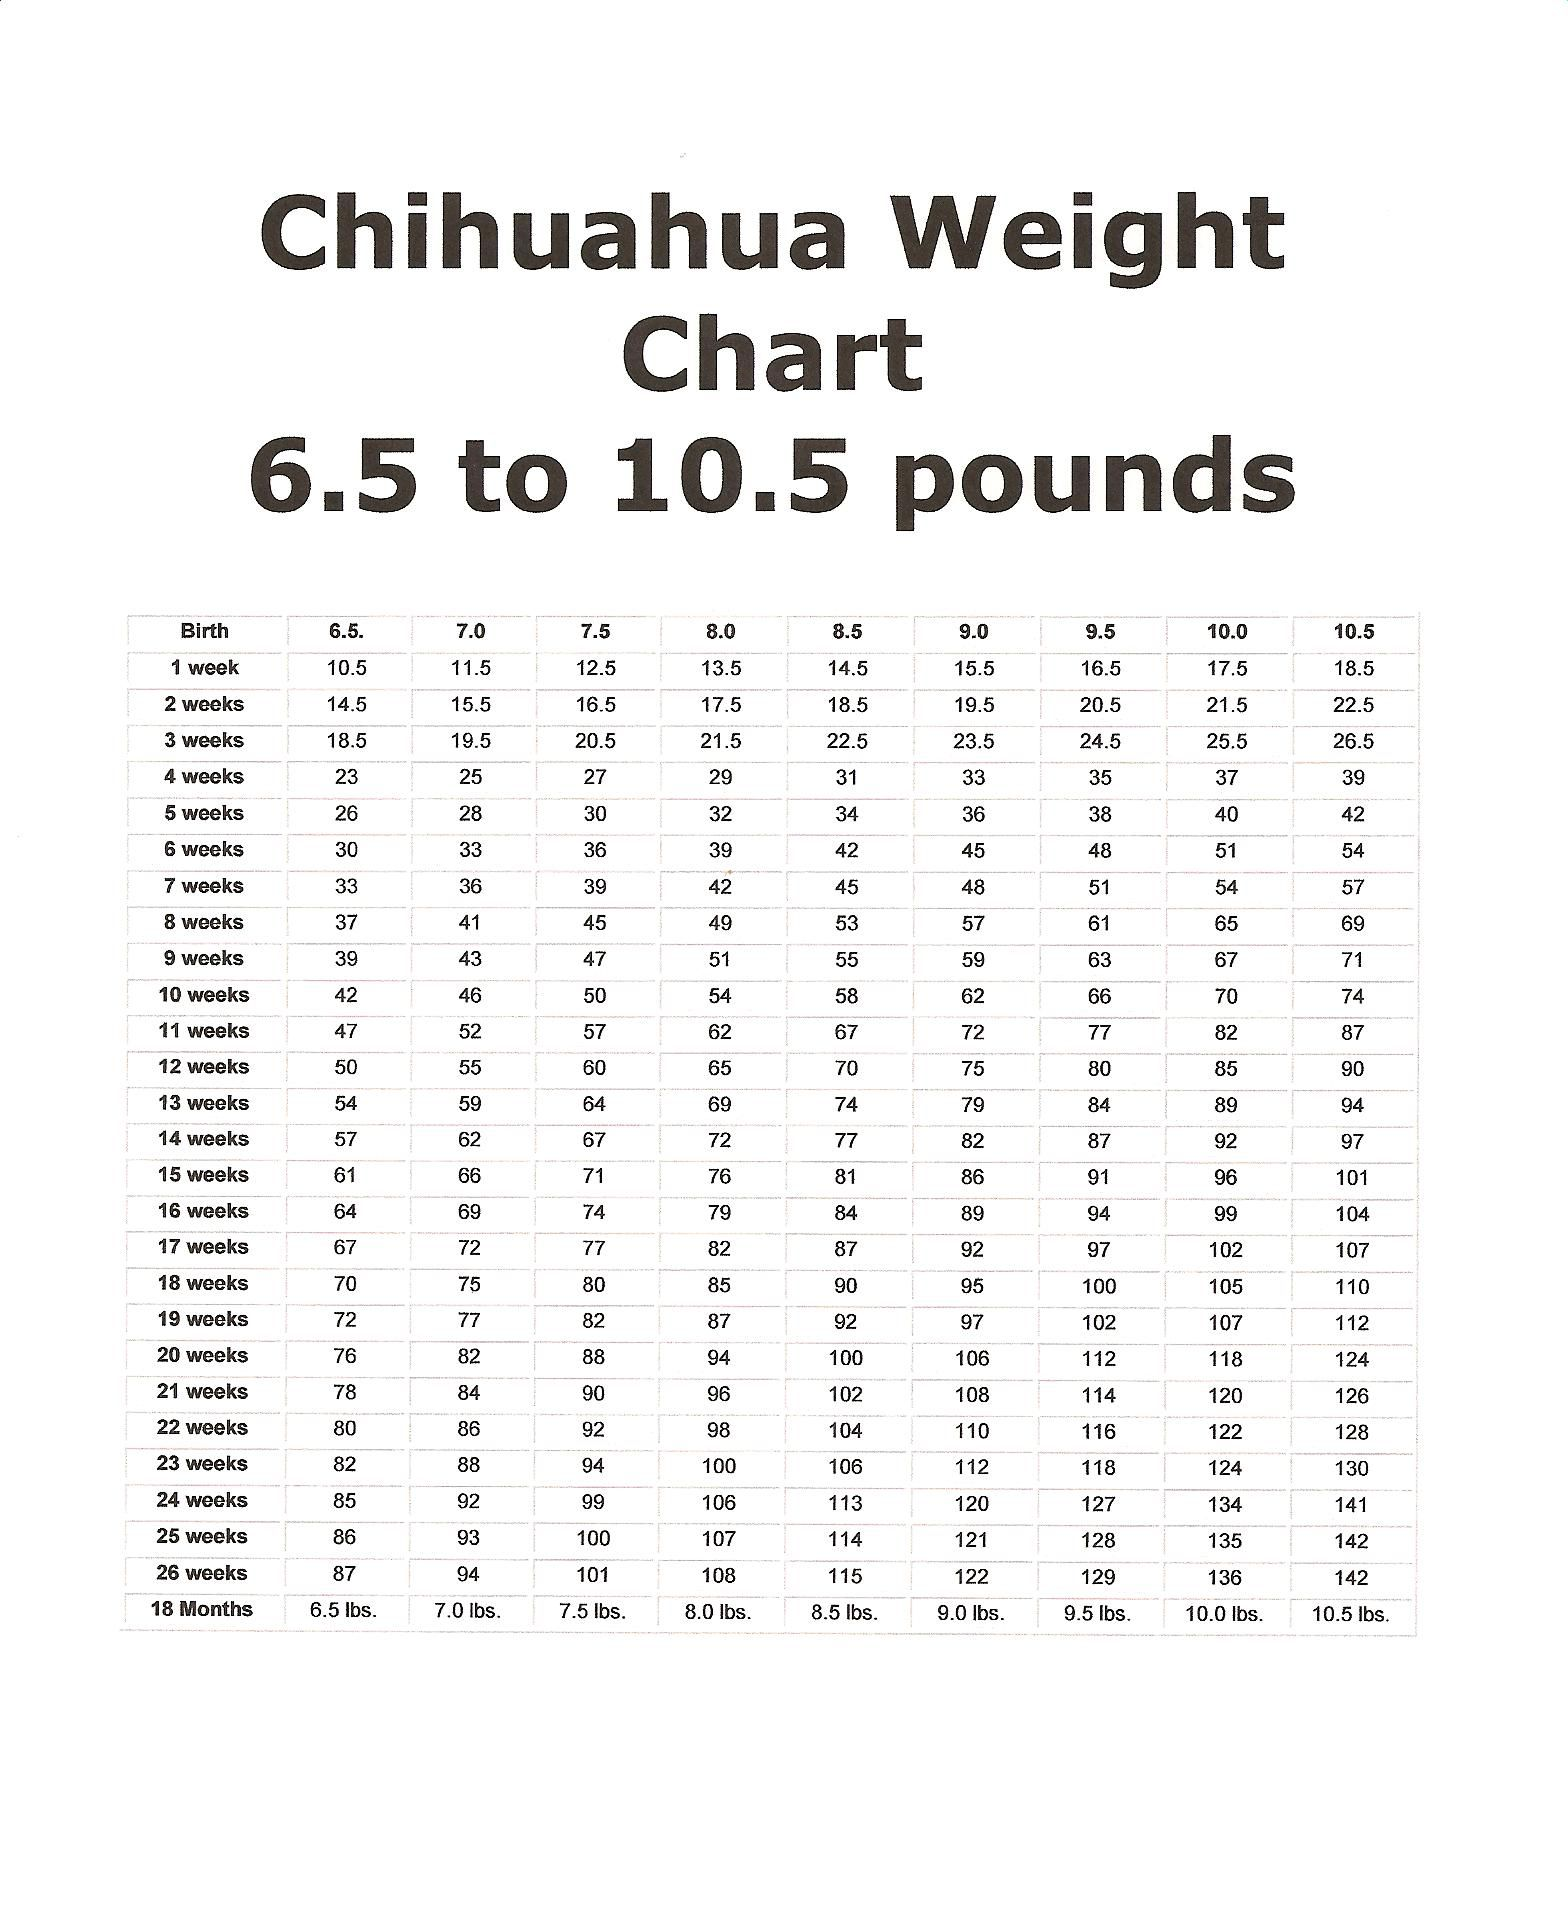 Chihuahua Puppy Weight Chart : chihuahua, puppy, weight, chart, Chihuahua, Weight, Chart, Growth, Daval